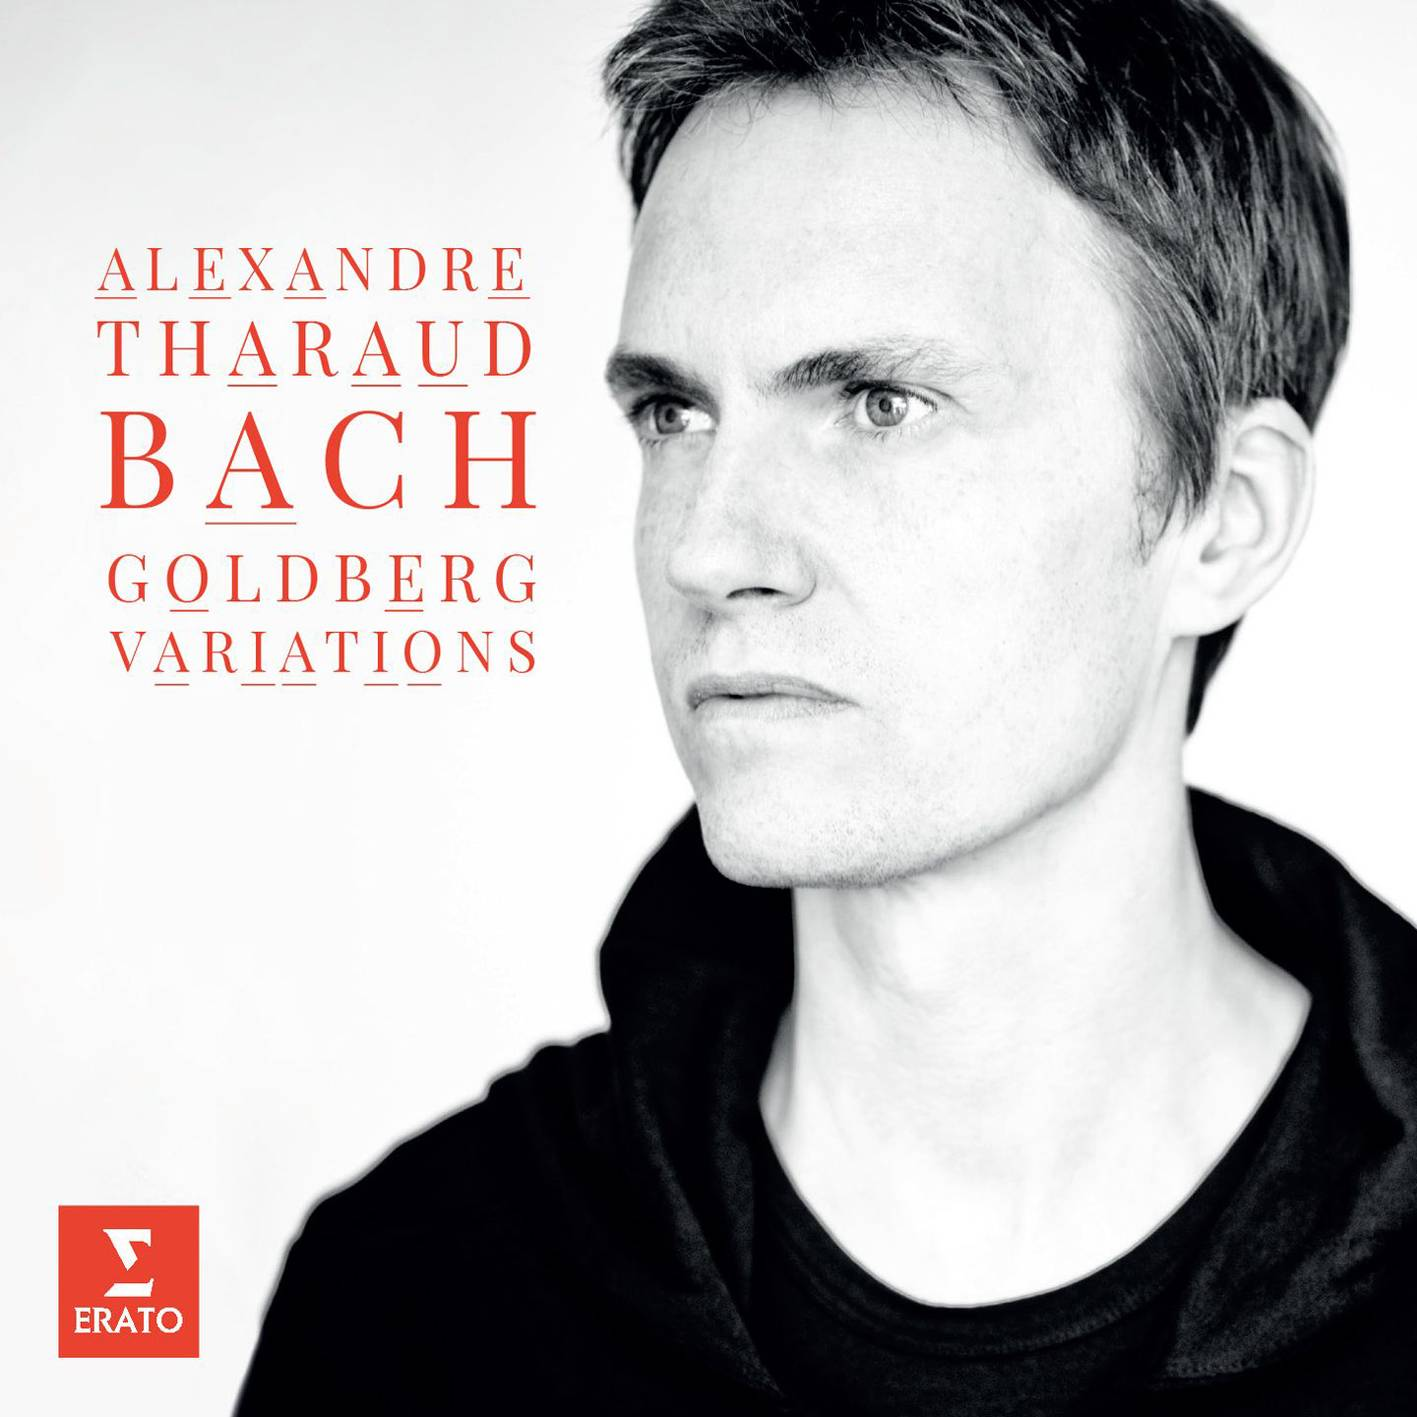 Alexandre Tharaud Bach Goldberg Variations 2015